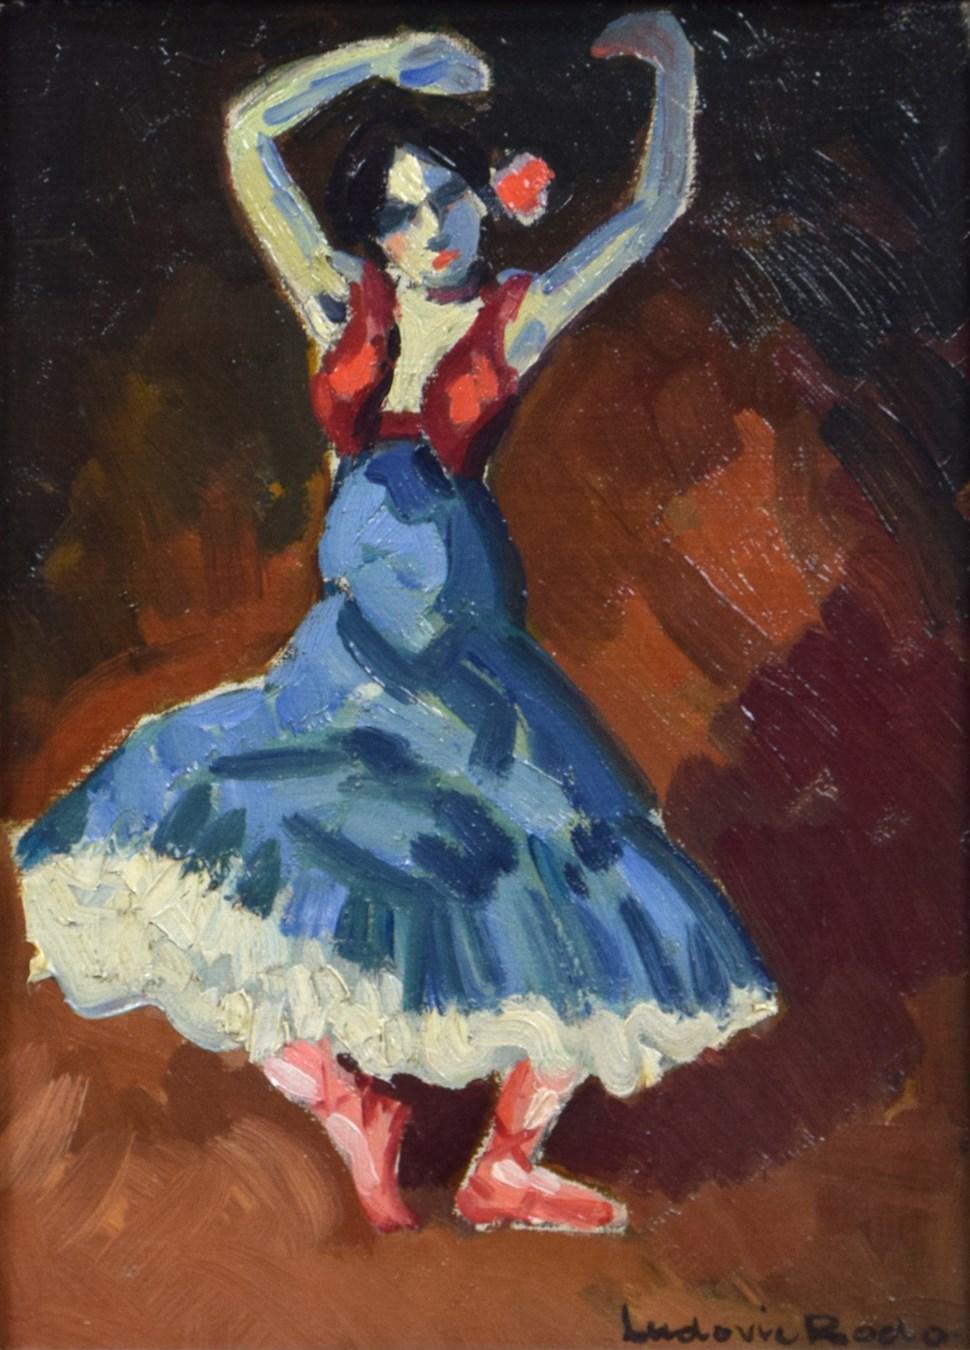 Danseuse Espagnole - Ludovic-Rodo Pissarro (1878 - 1952)